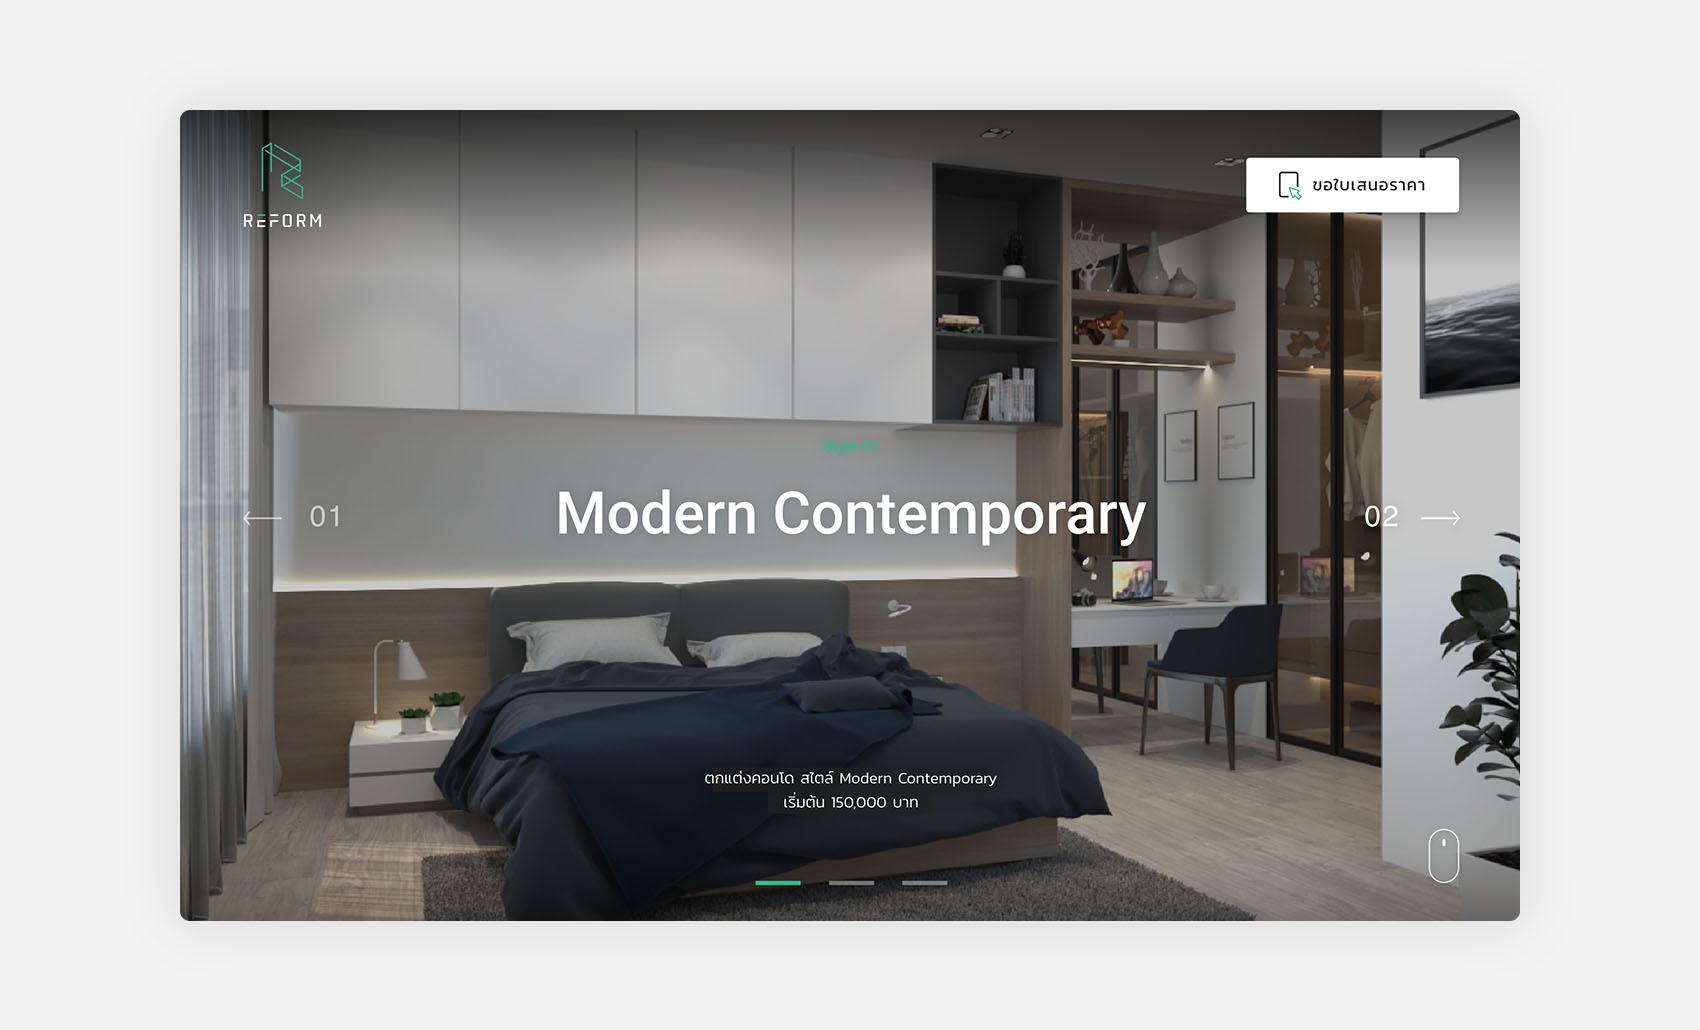 Reform Furniture